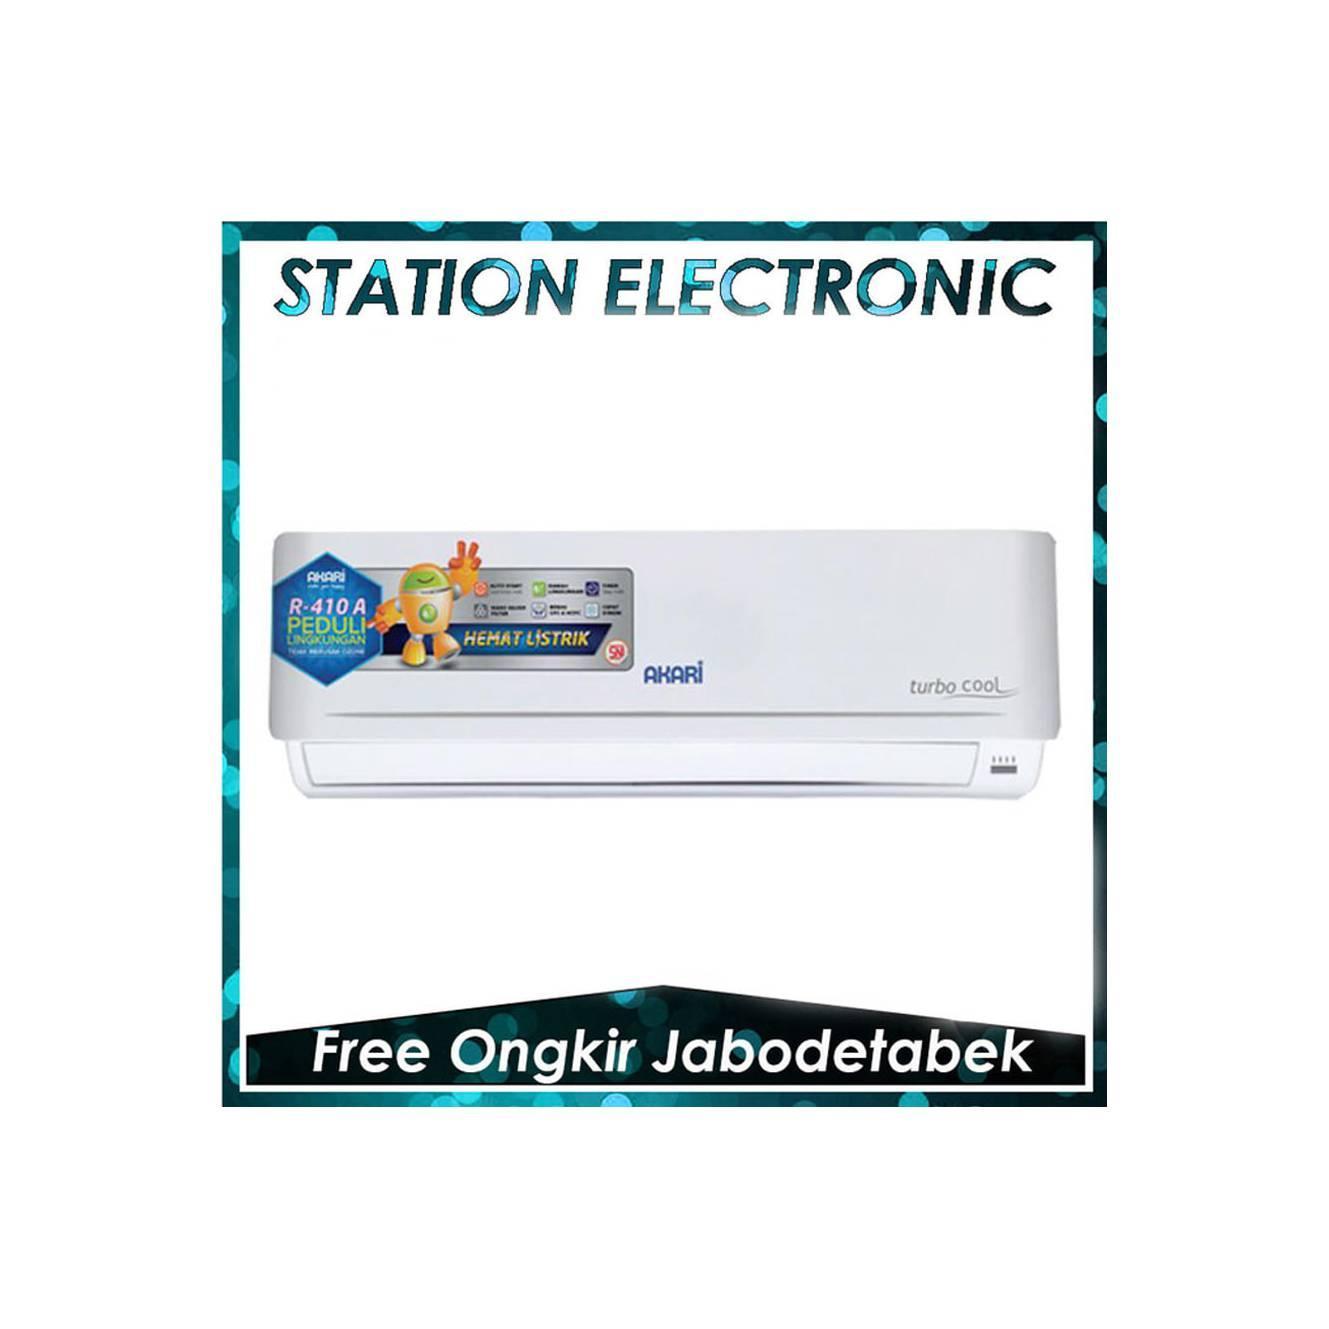 Akari Air Conditioner Low Watt 375 12 Pk Ac 0568 Glw Putih Gree Gwc 09coo Ac